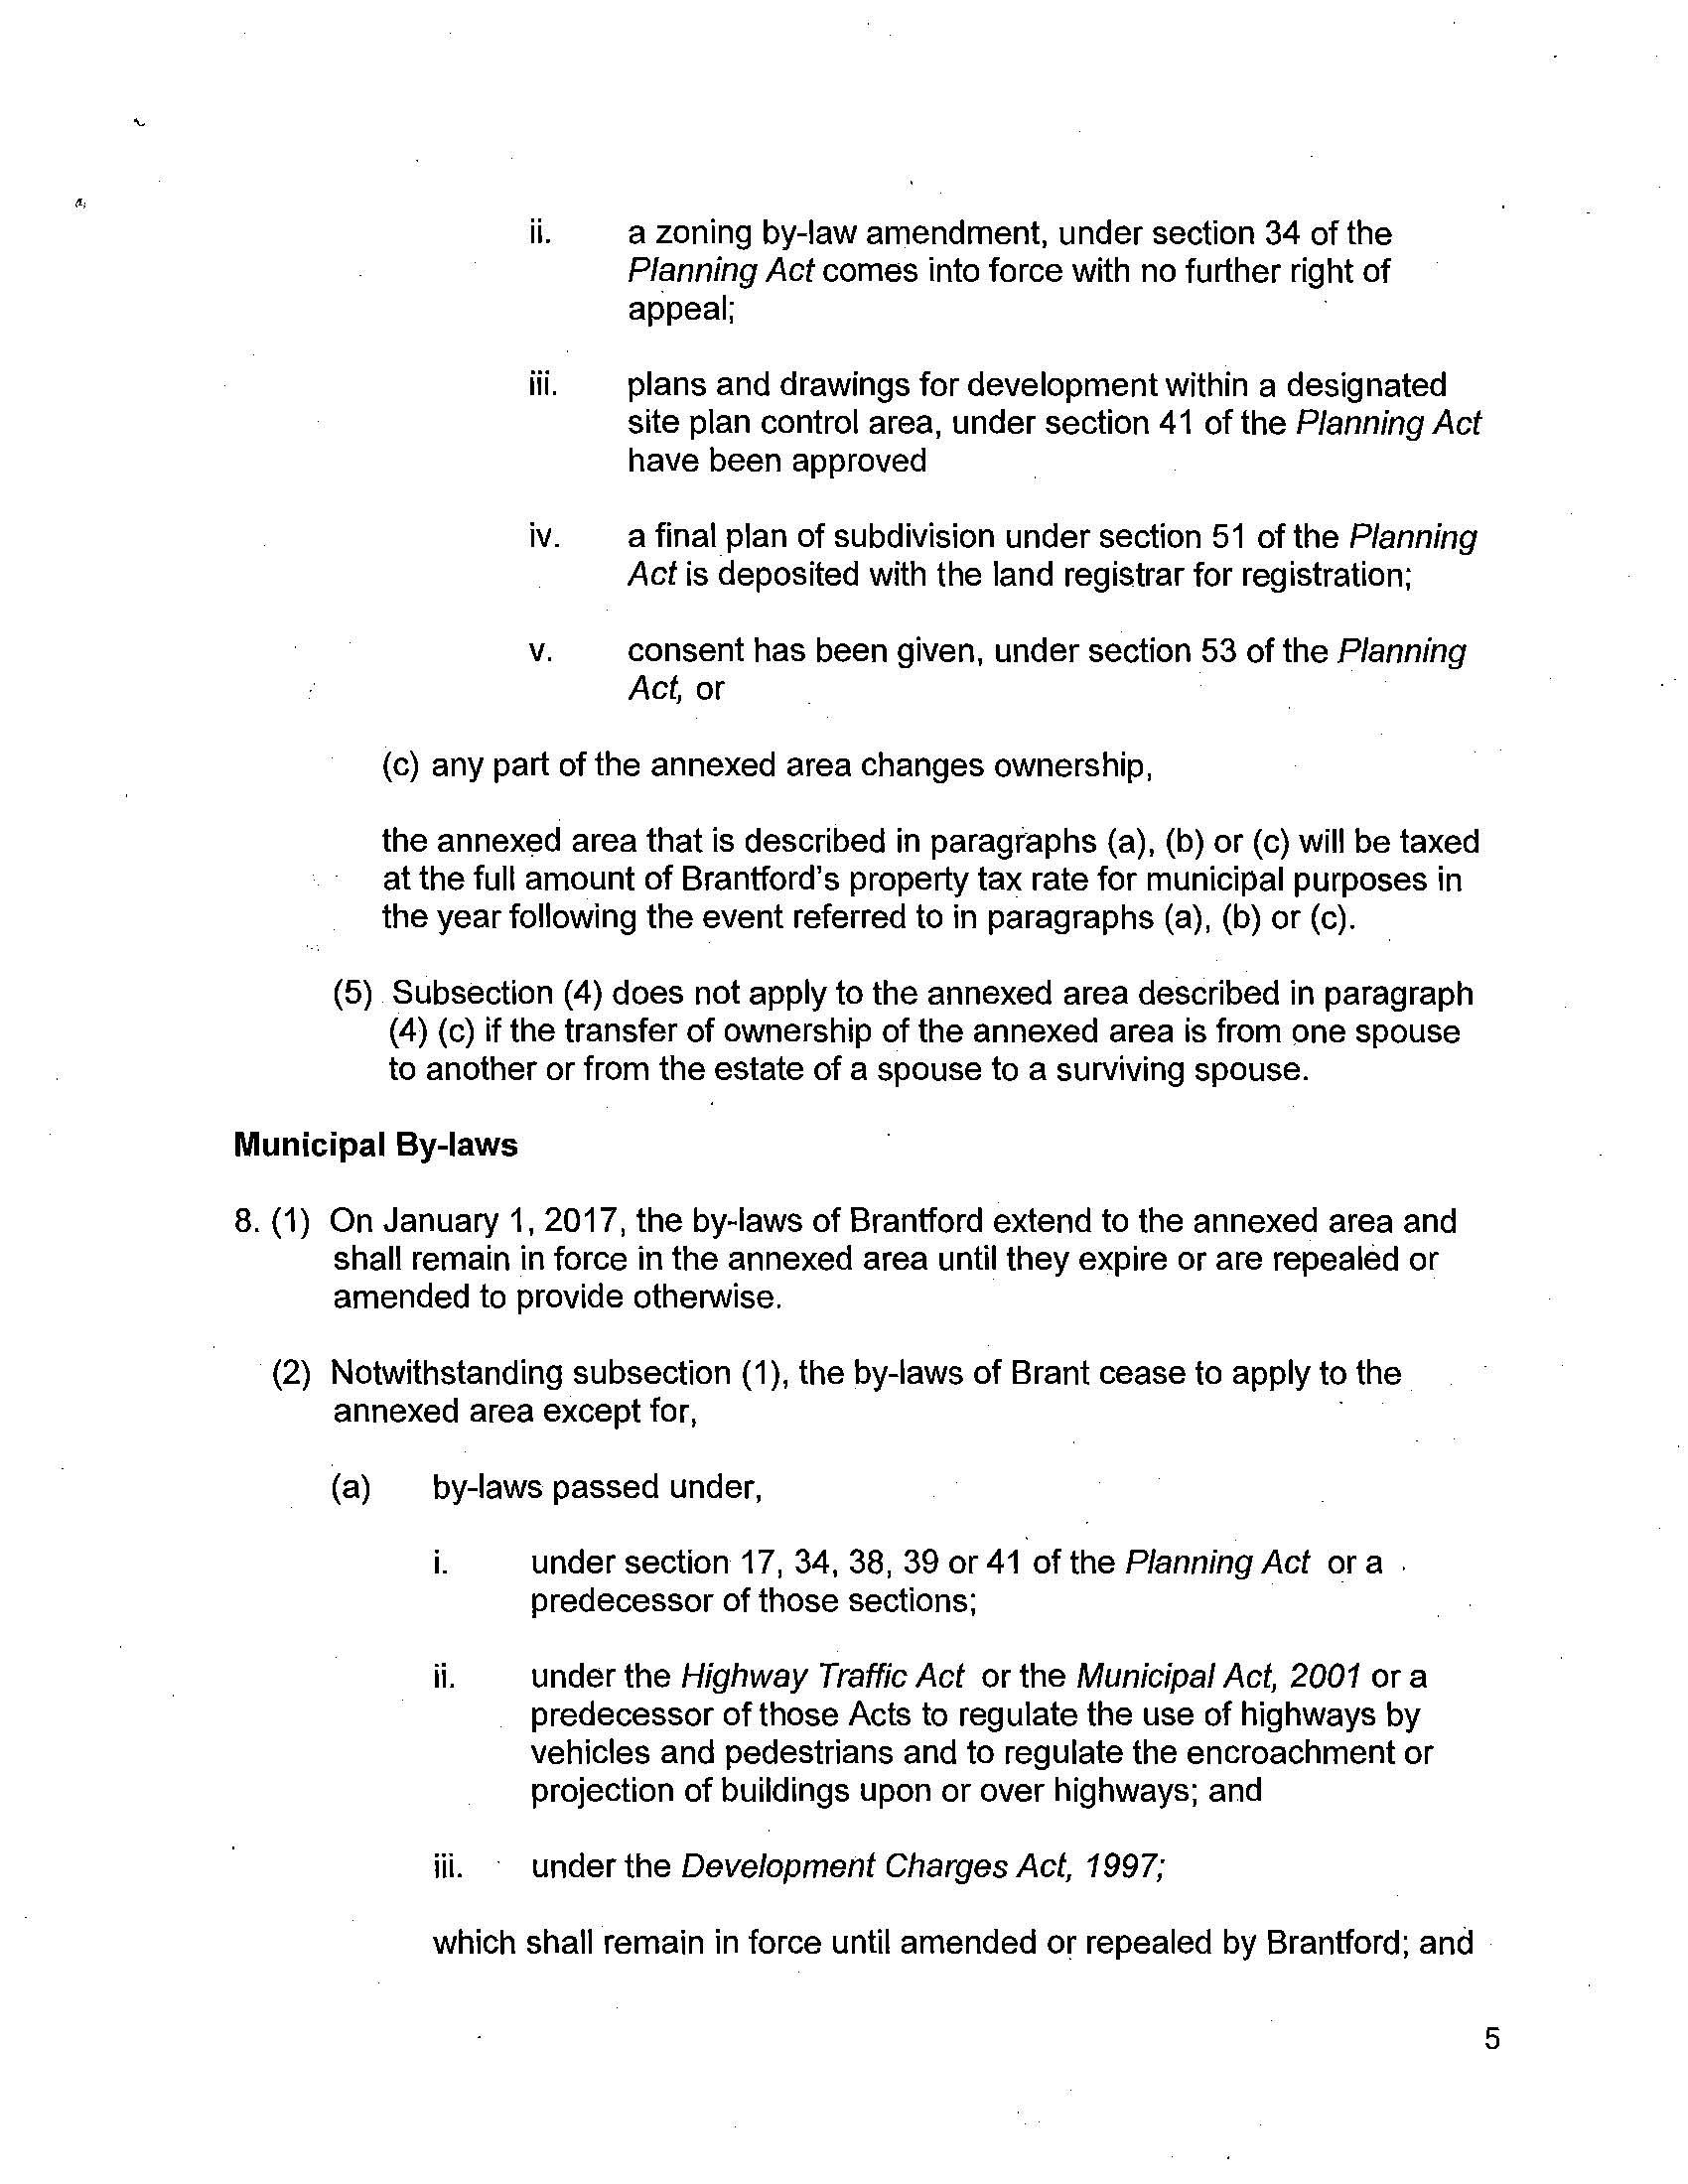 Brantford_Boundary_Signed_Order_Page_05.jpg